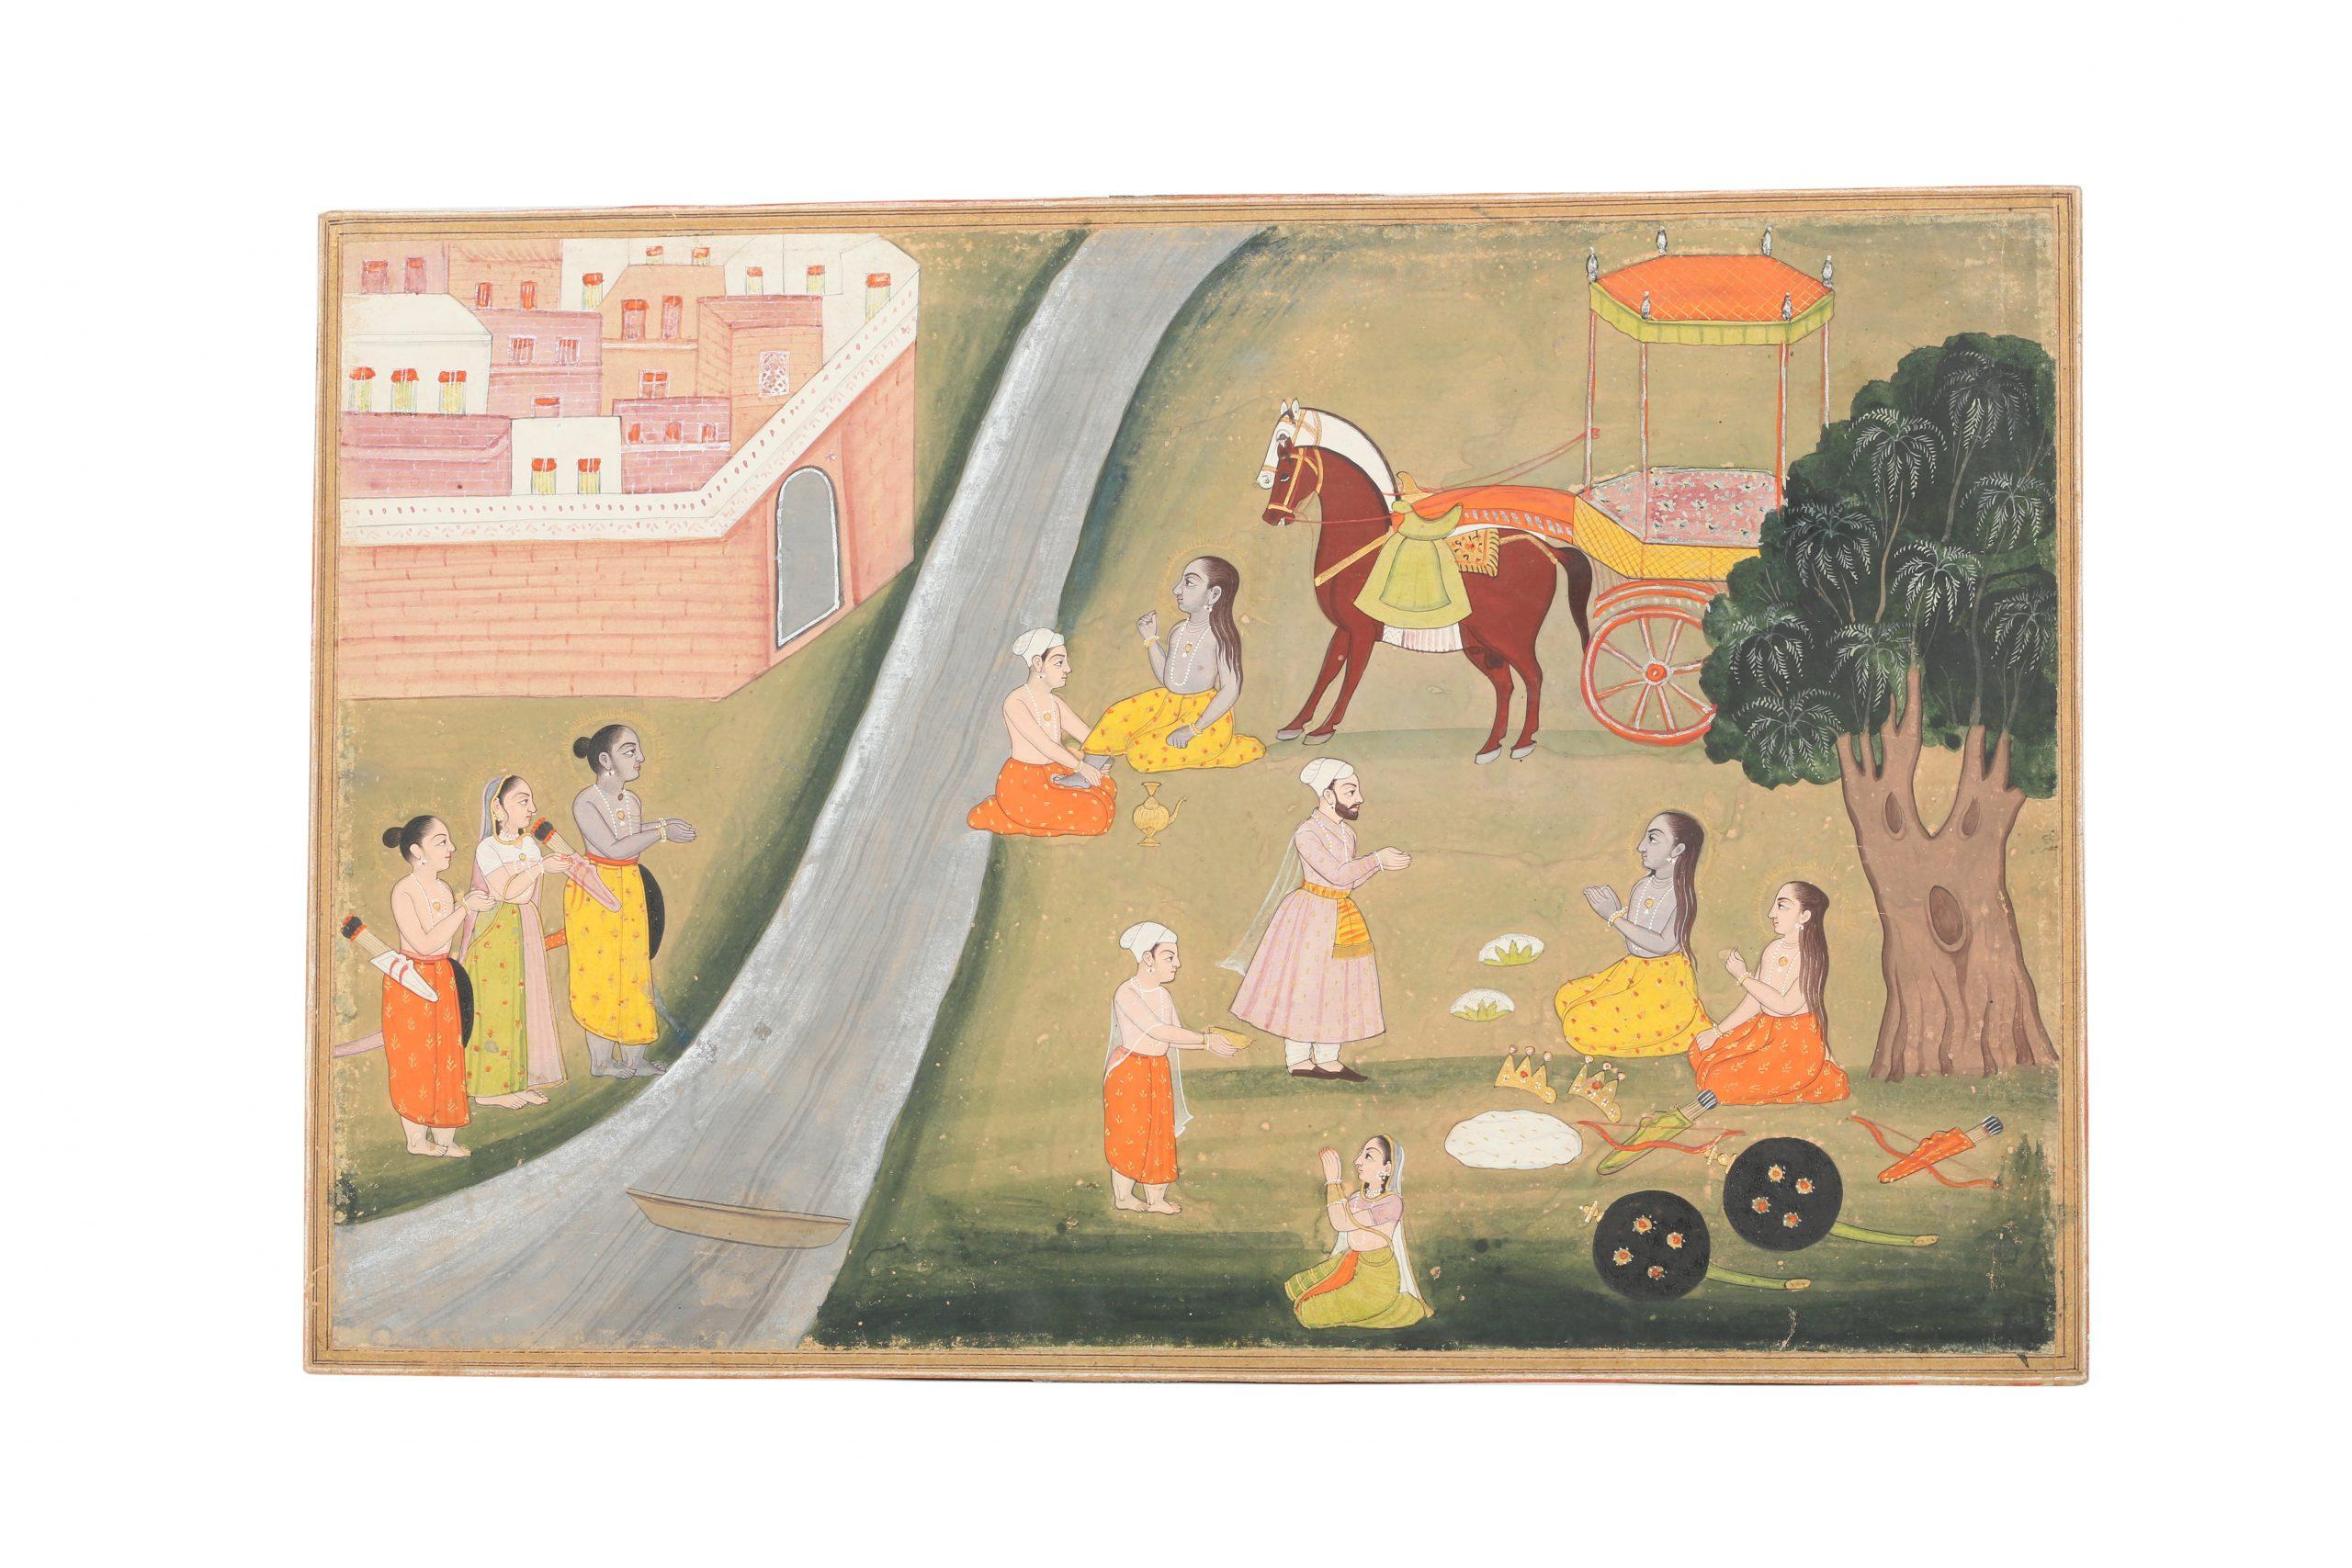 An illustration to a Ramayana series: Rama, Sita and Lakshmana returning to Ayodhya Jodhpur, Rajasthan, North-Western India, circa 1820-1840. Estimate £800 - £1,200